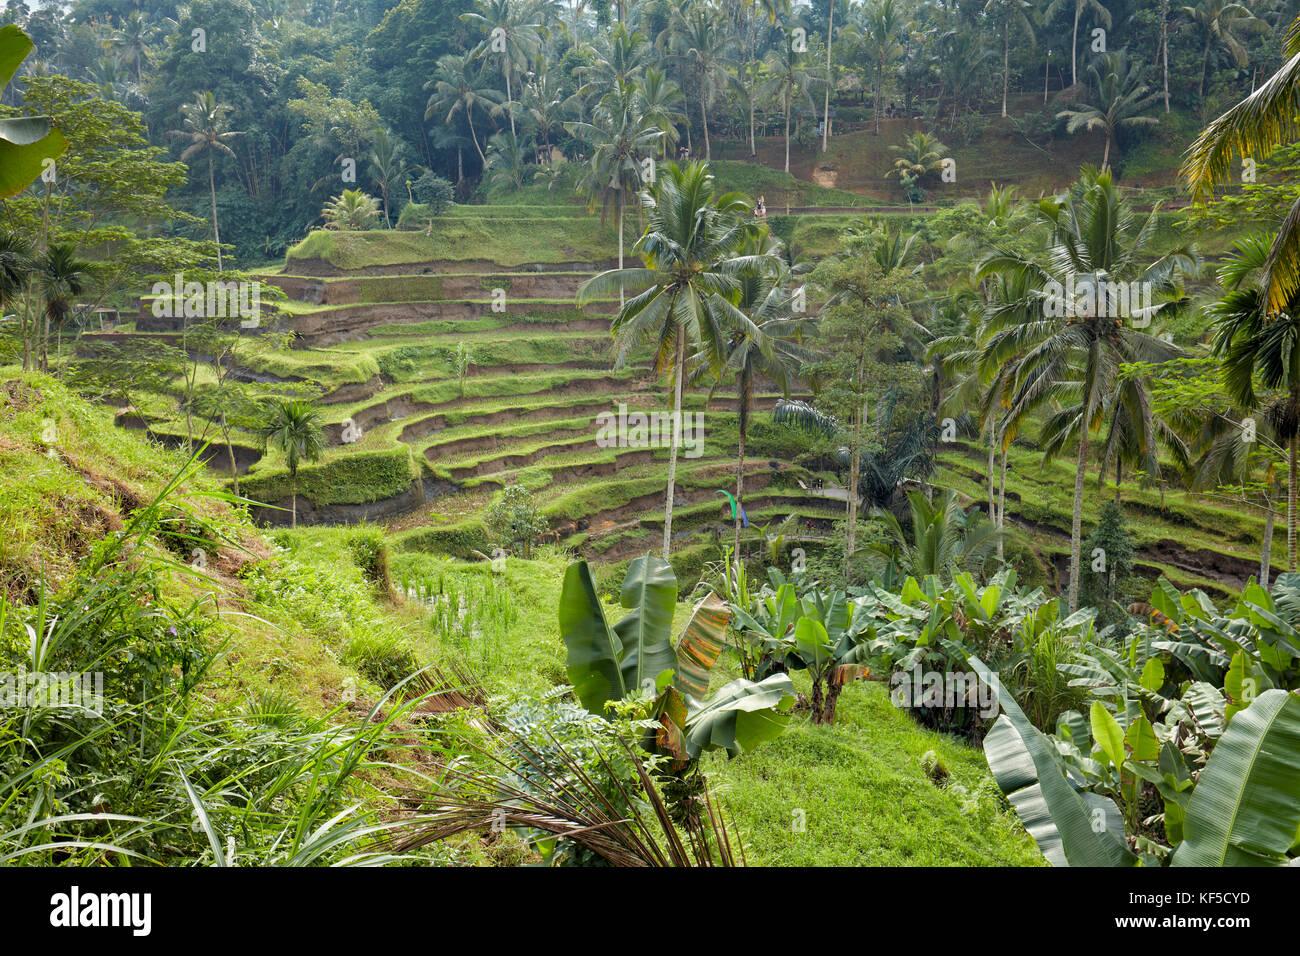 Tegalalang Reis Terrasse. Tegalalang Village, Bali, Indonesien. Stockbild